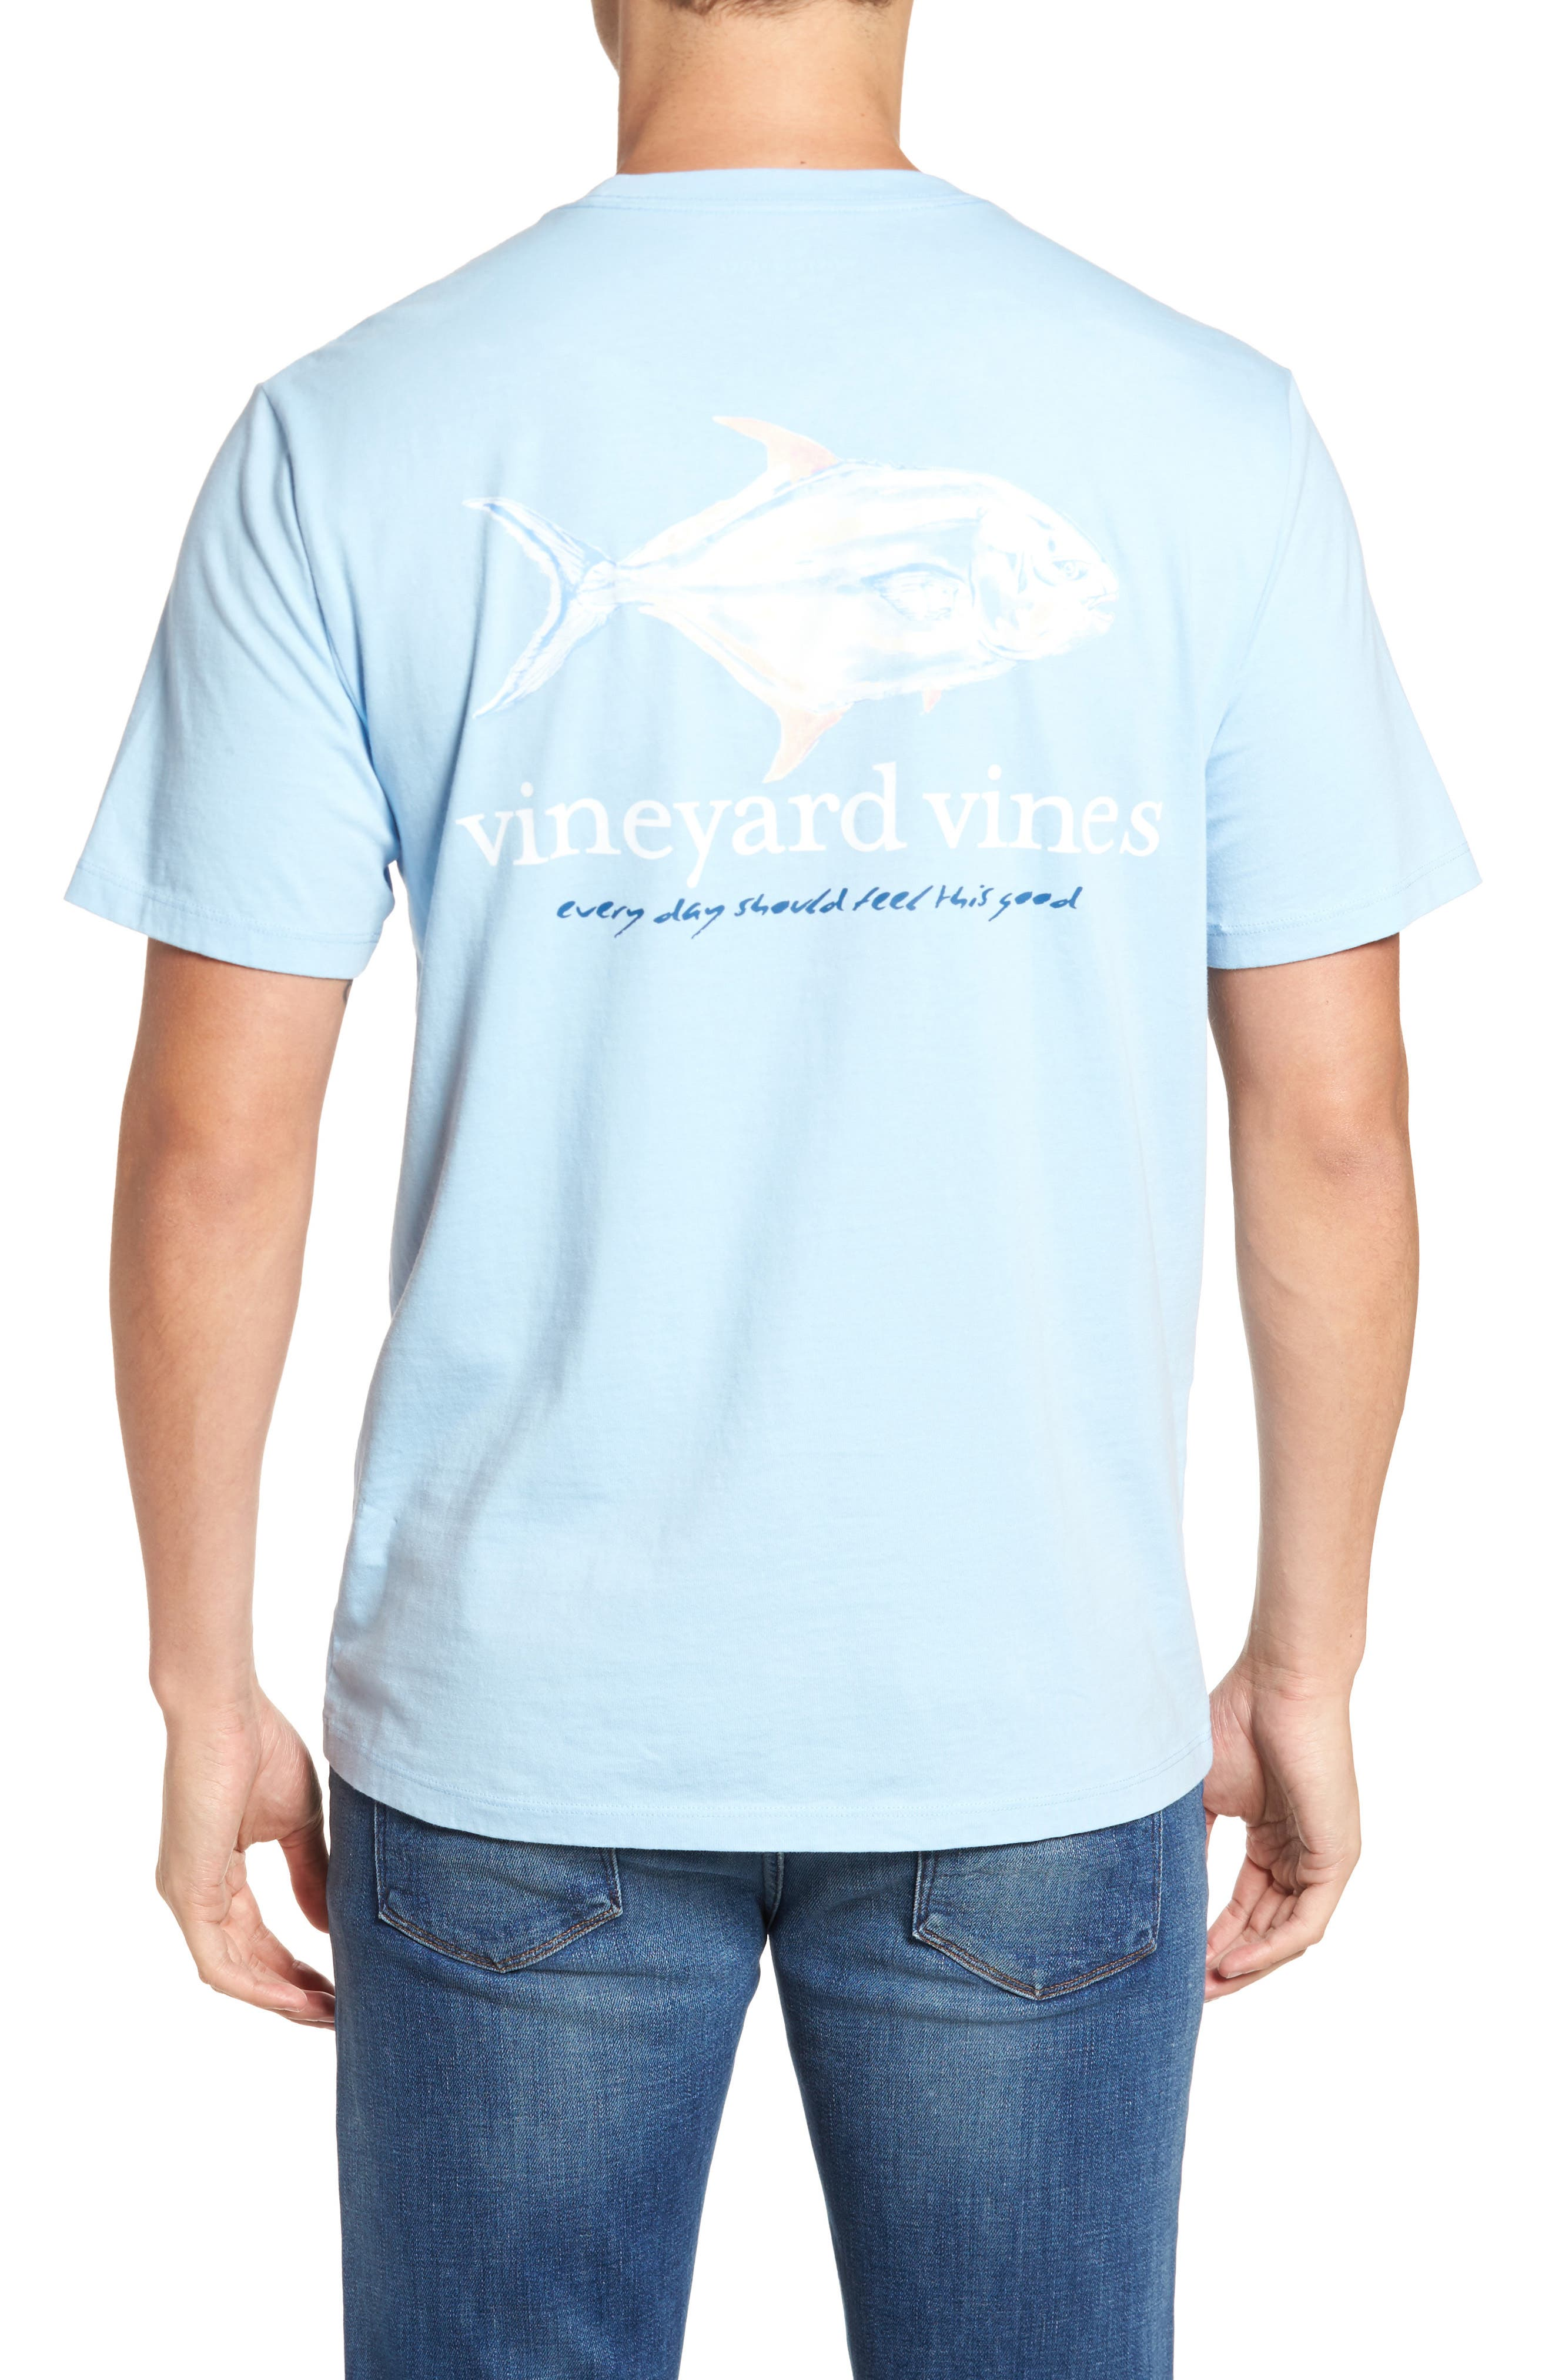 Main Image - vineyard vines Painted Permit Graphic Pocket T-Shirt